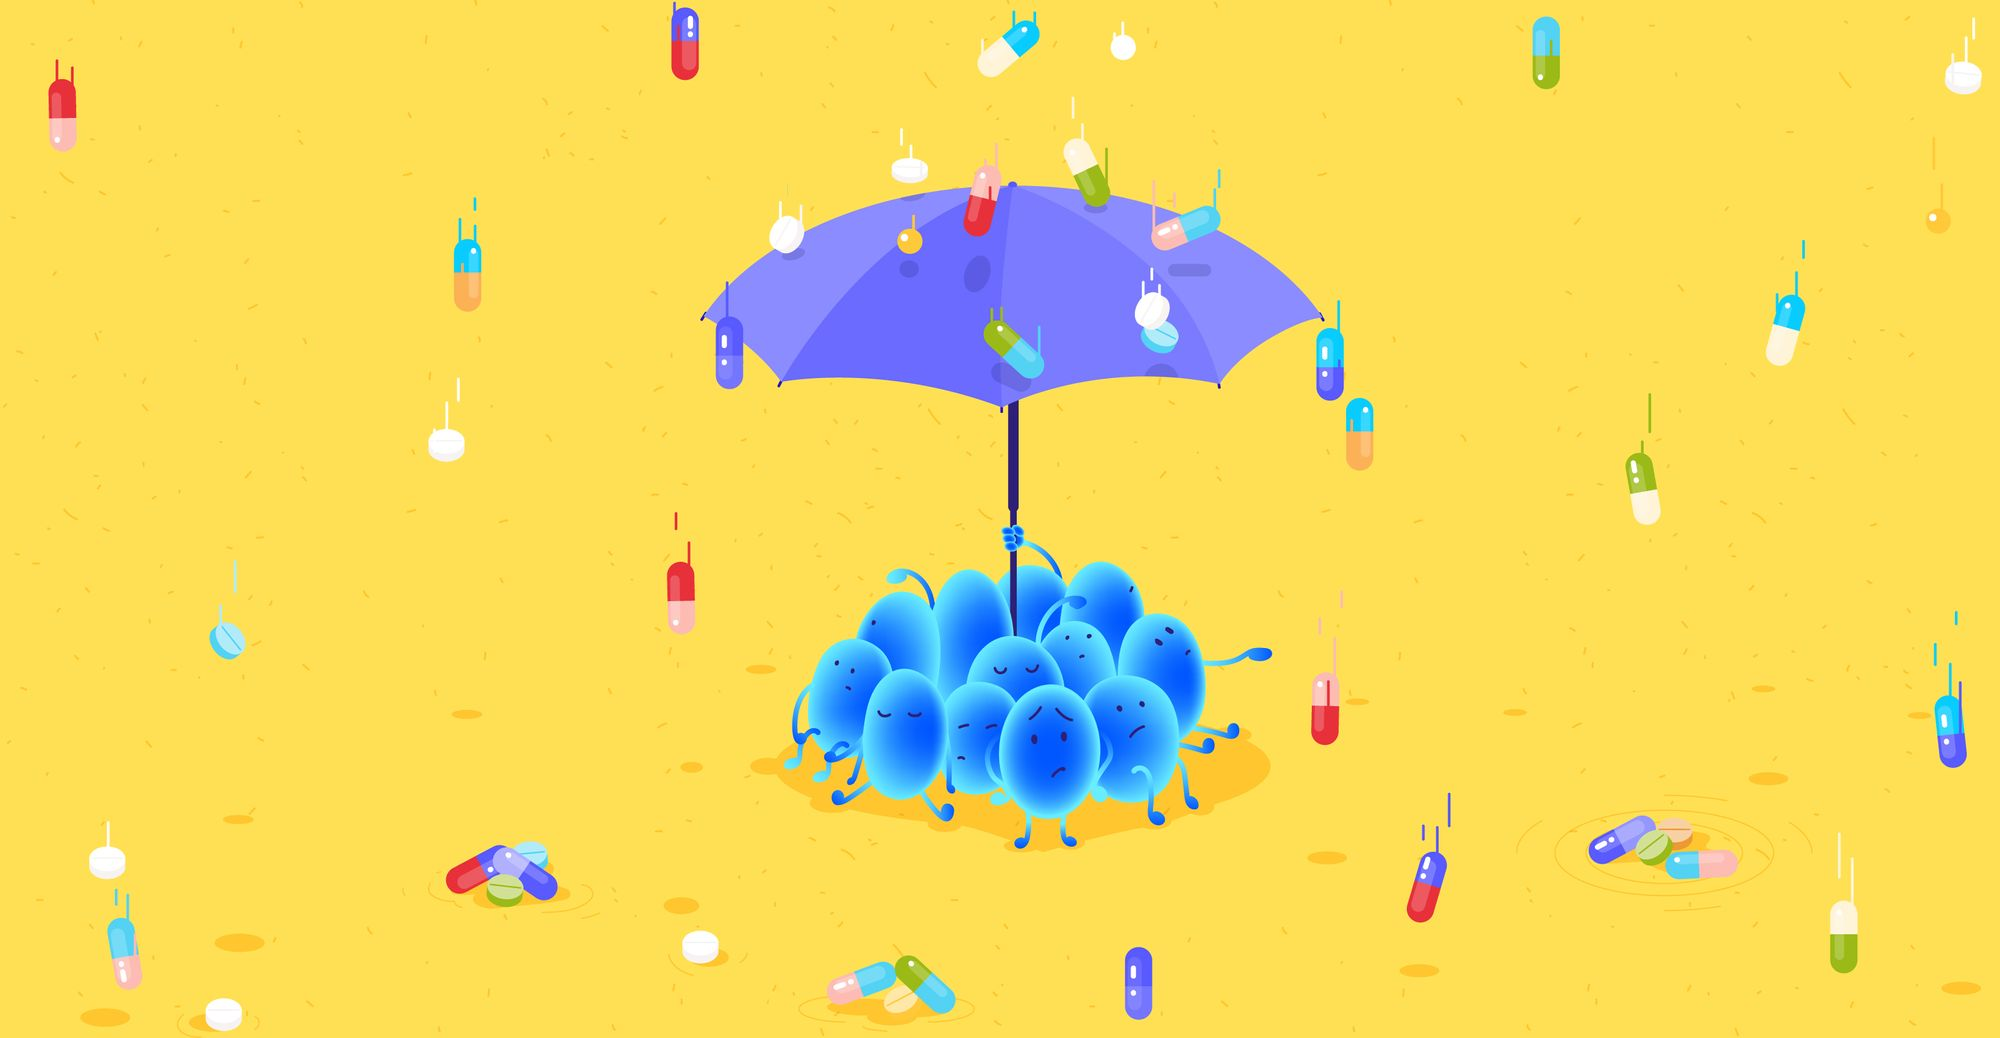 2019_06_03_raining_pil--3-